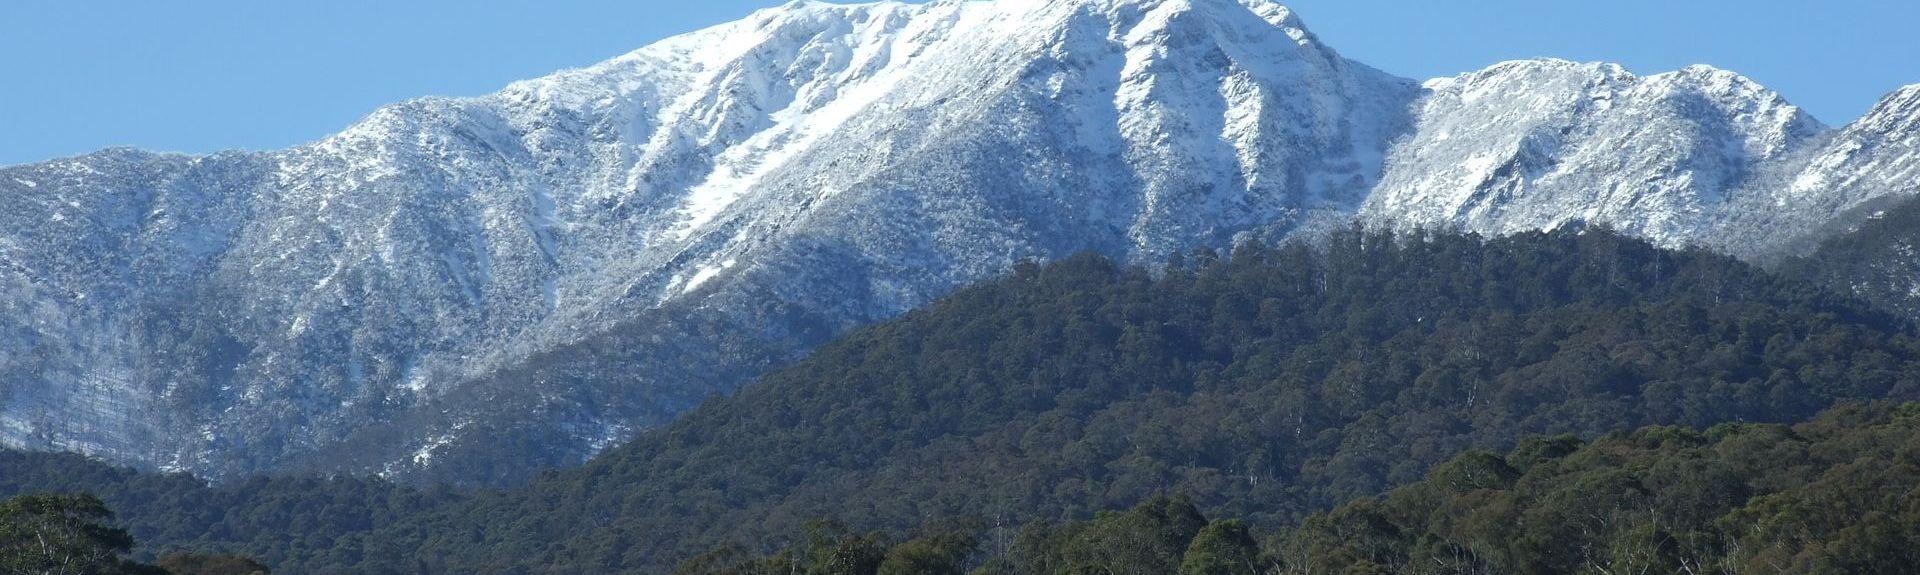 Mount Buller Peak, Mount Buller, Victoria, AU